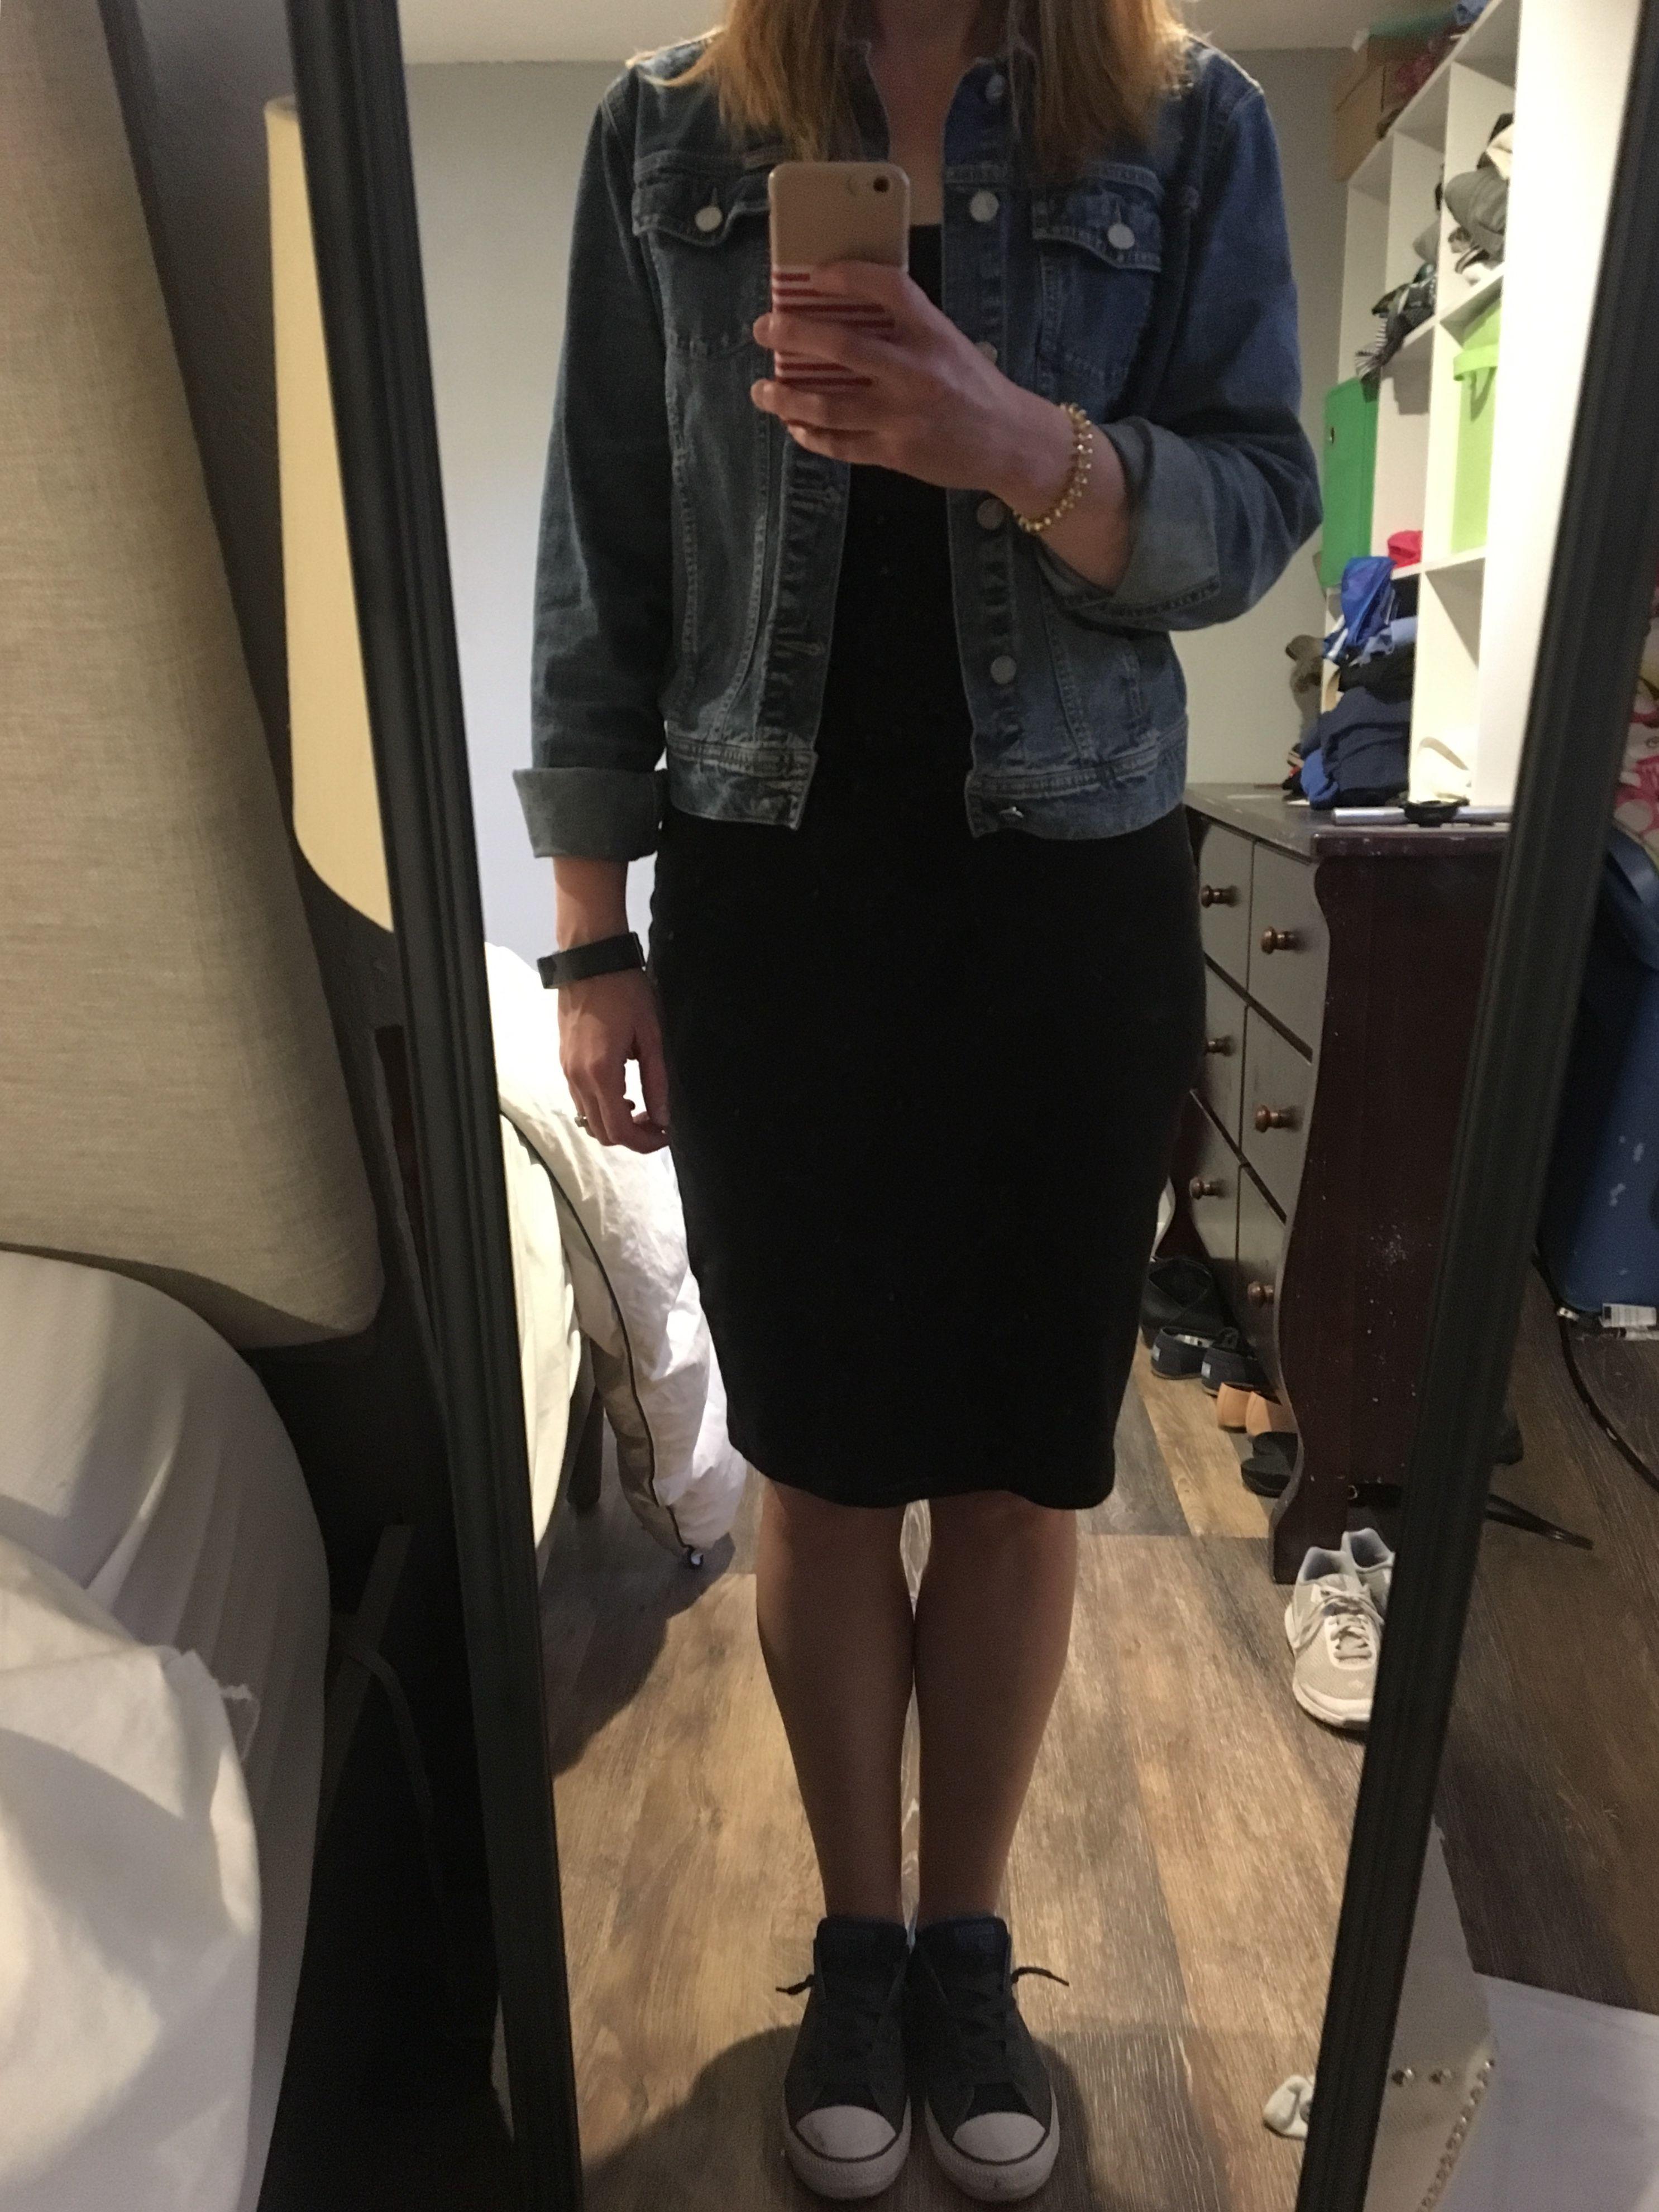 Ootd Black Bodycon Dress Jean Jacket Converse Shoes Black Bodycon Dress Black Bodycon Bodycon Dress [ 3962 x 2971 Pixel ]